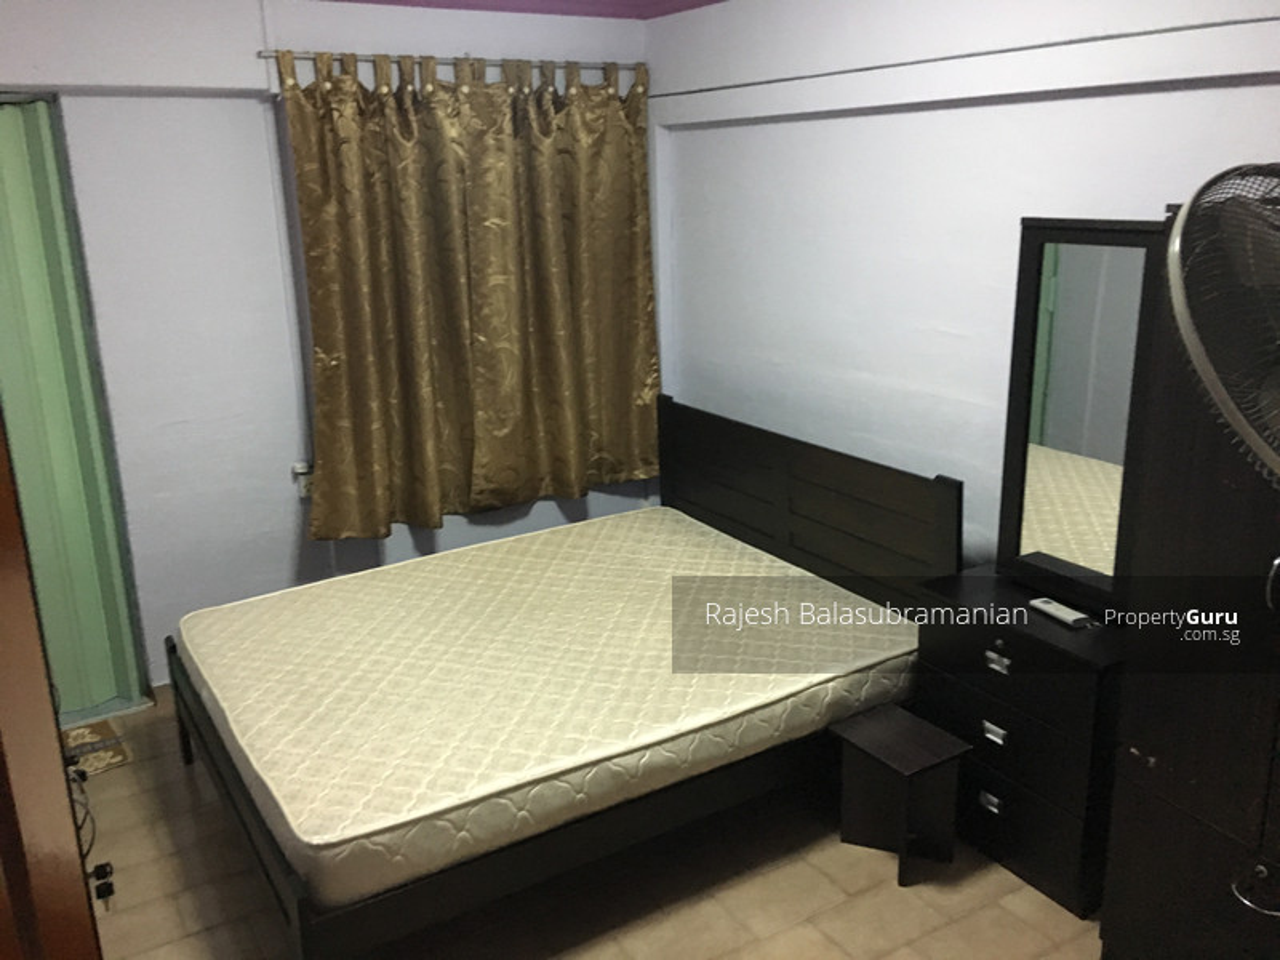 110 Jurong East Street 13 110 Jurong East Street 13 1 Bedroom 861 Sqft Hdb Flats For Rent